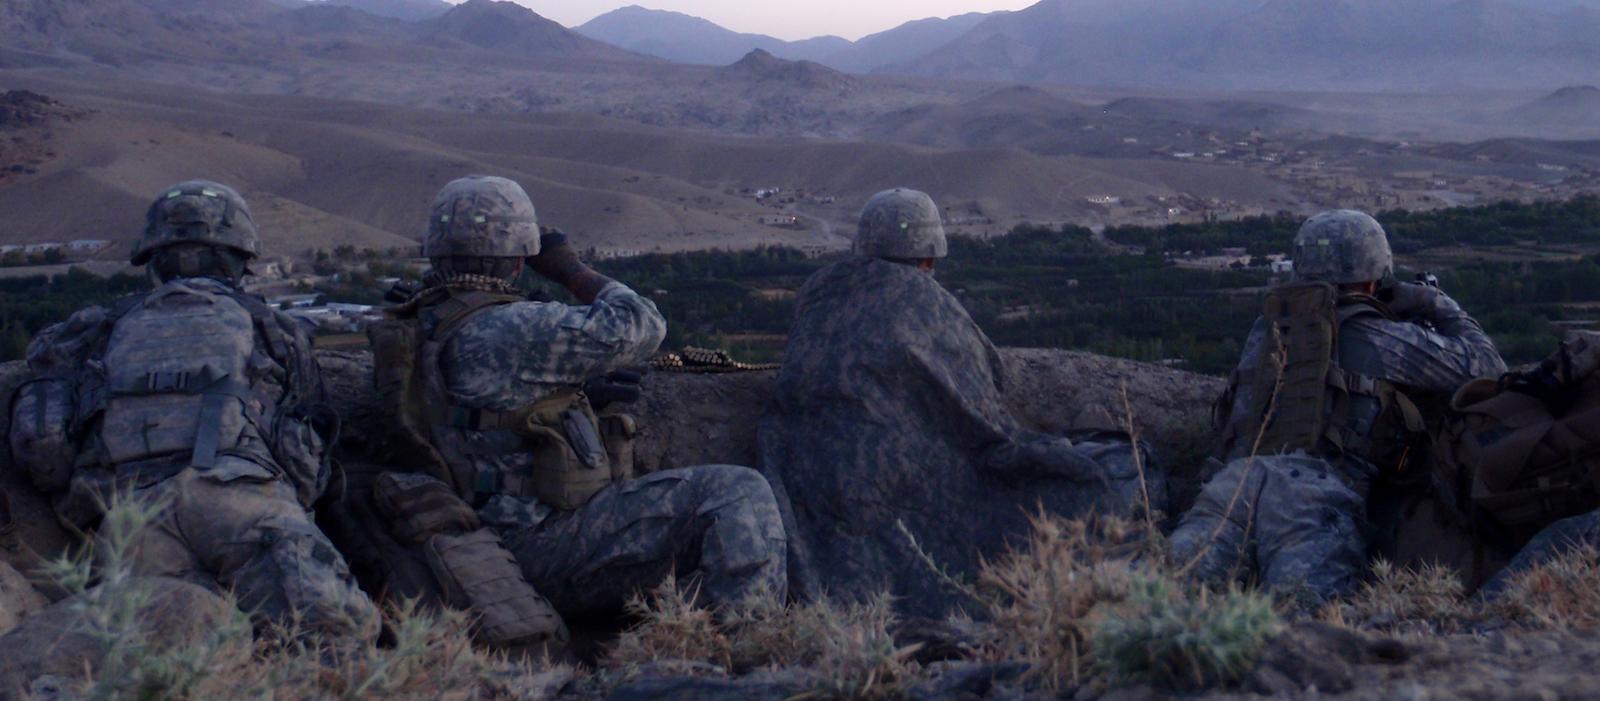 US Army Soldiers in Afghanistan (Photo: DVIDSHUB/ Flickr)